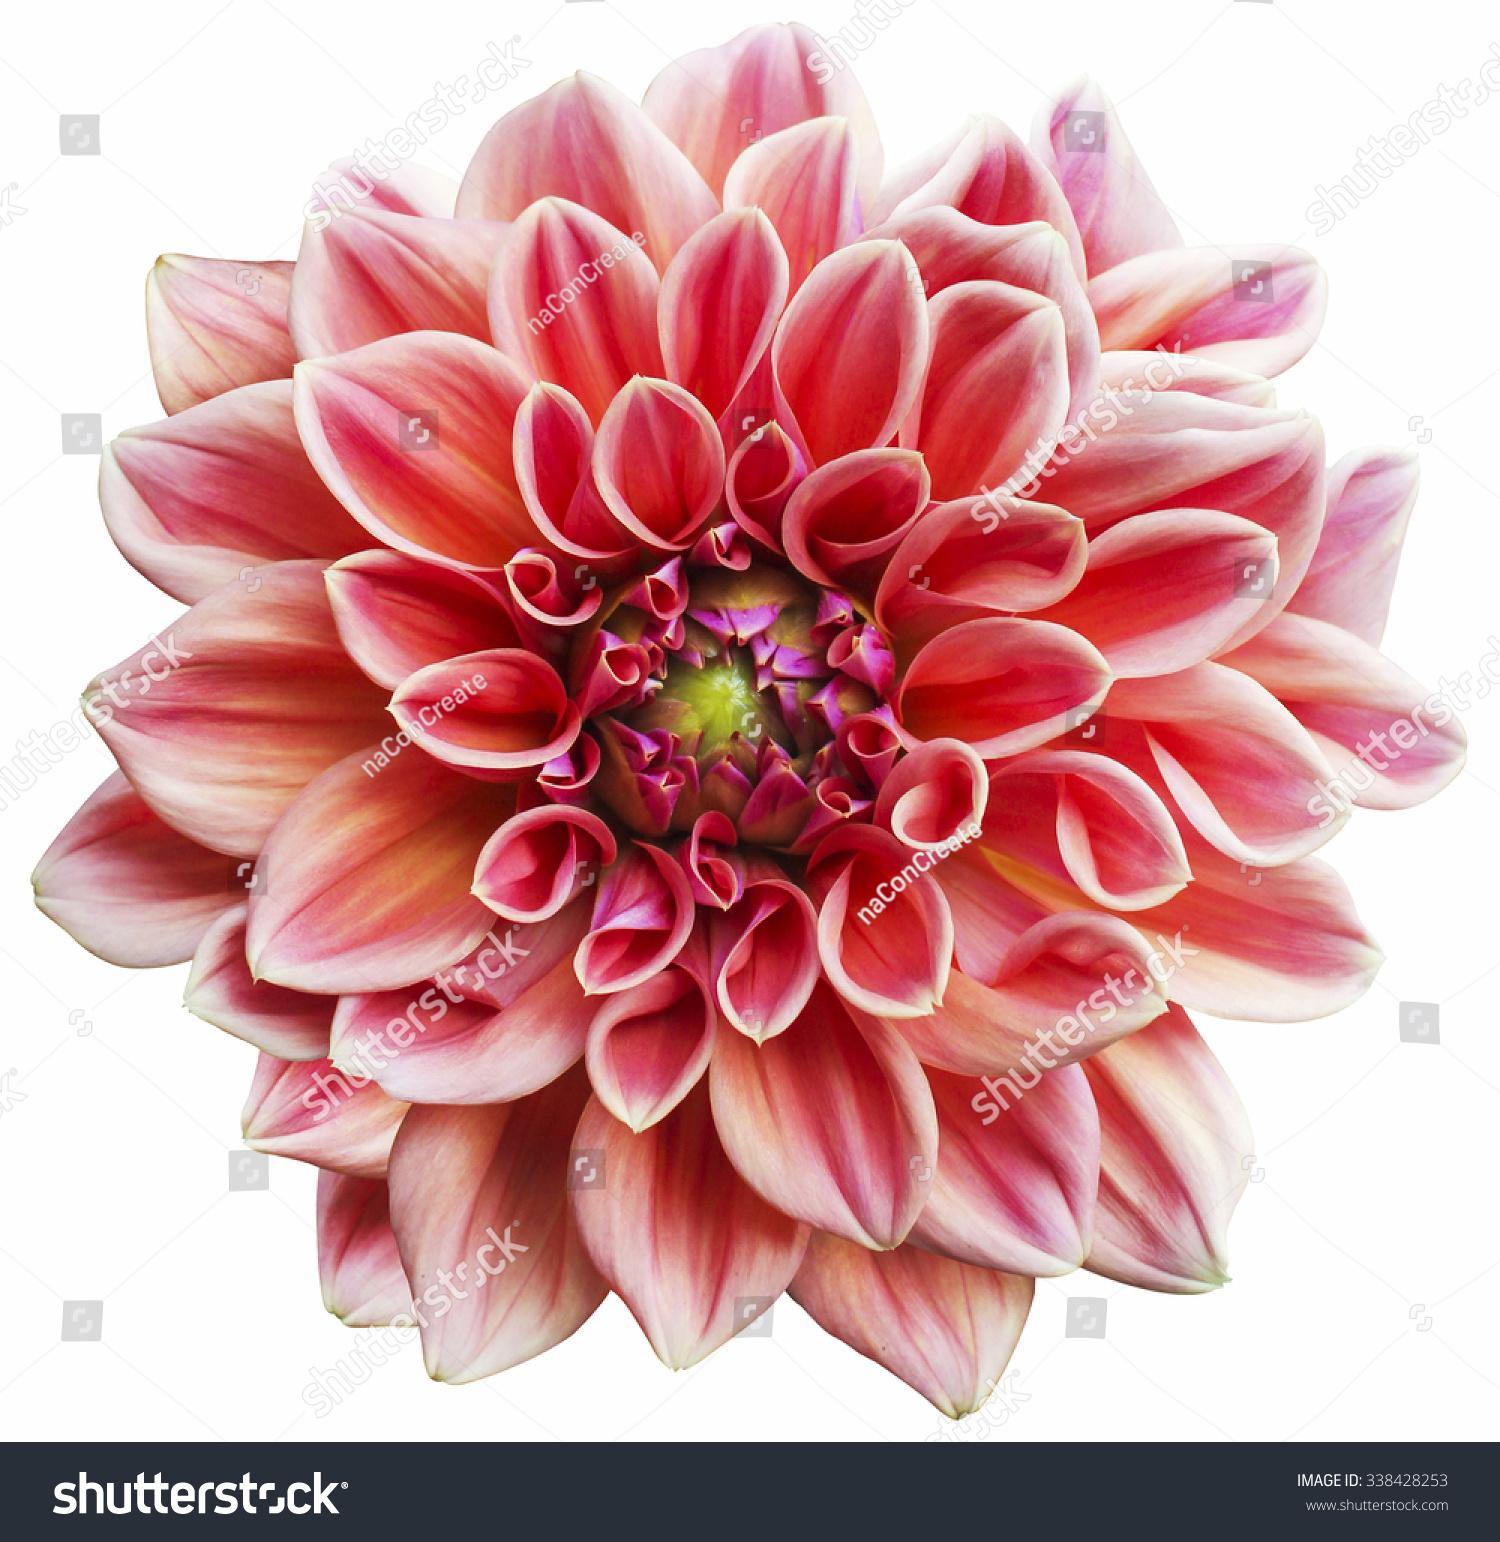 Pink dahlia flower isolated on white stock photo edit now pink dahlia flower isolated on white background izmirmasajfo